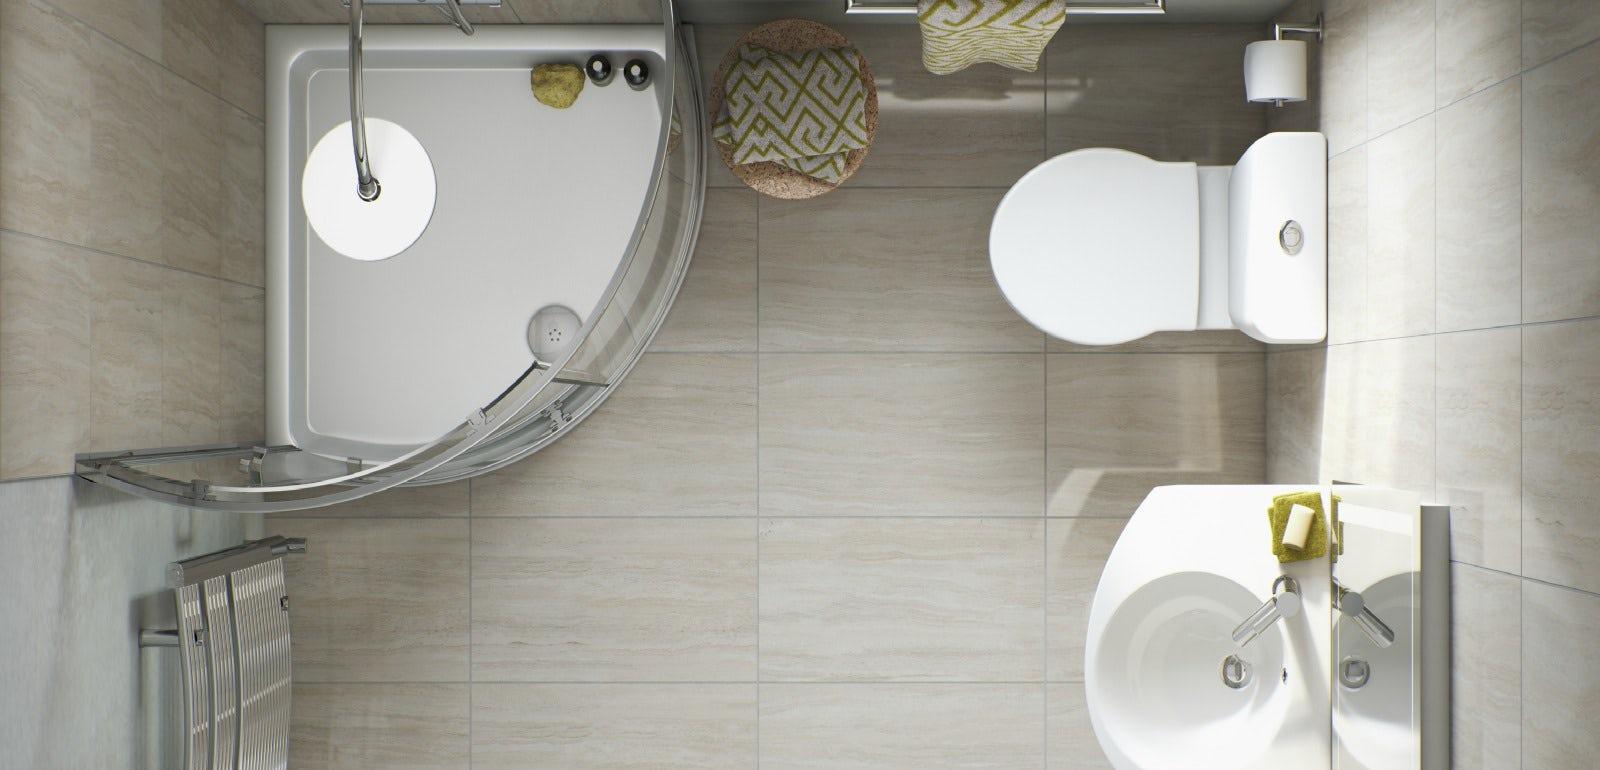 Bathroom layout and measurement advice